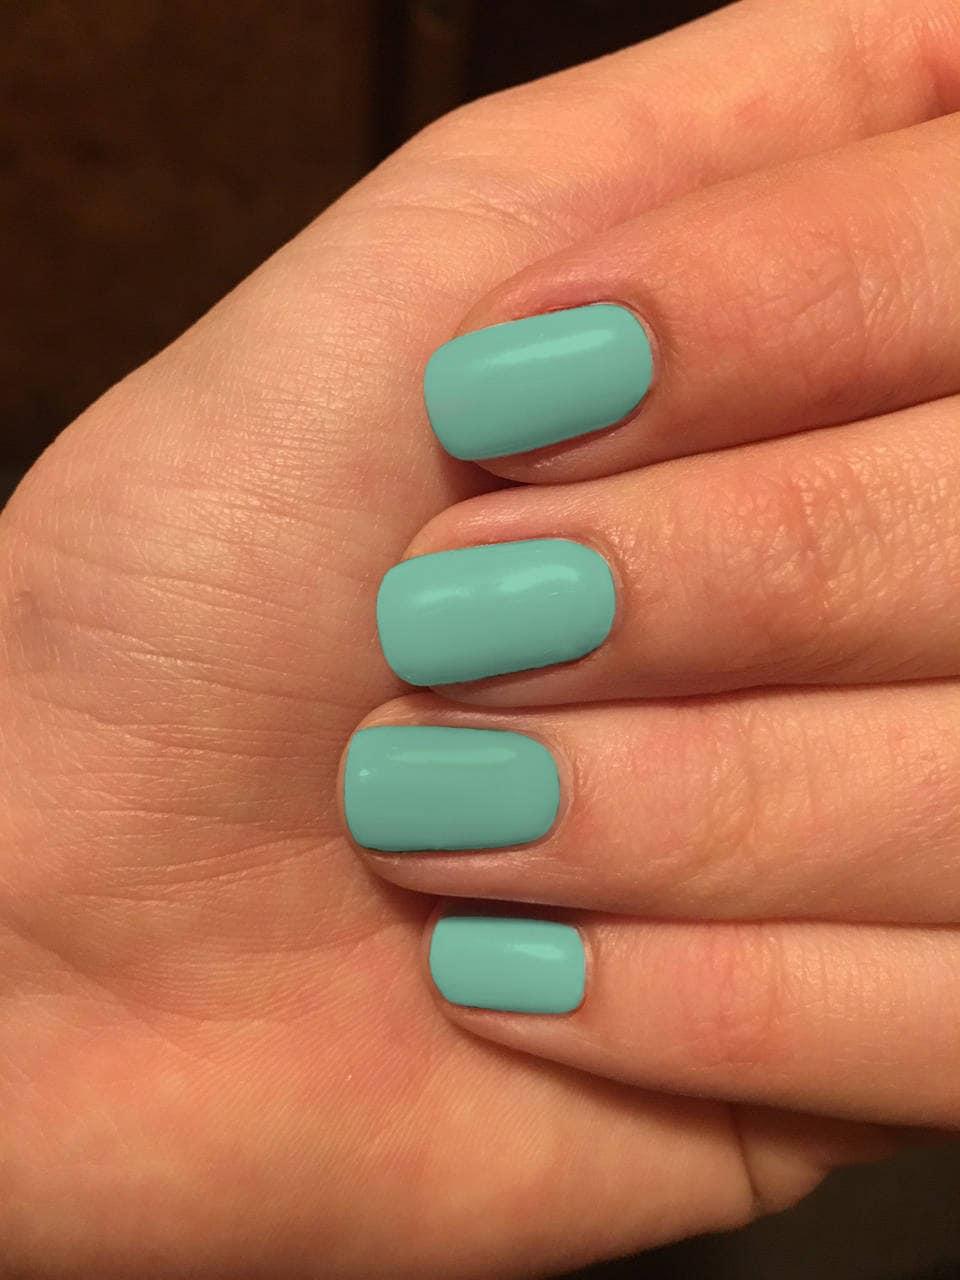 Nail wraps Mint nail wraps custom colored nails nail polish   Etsy